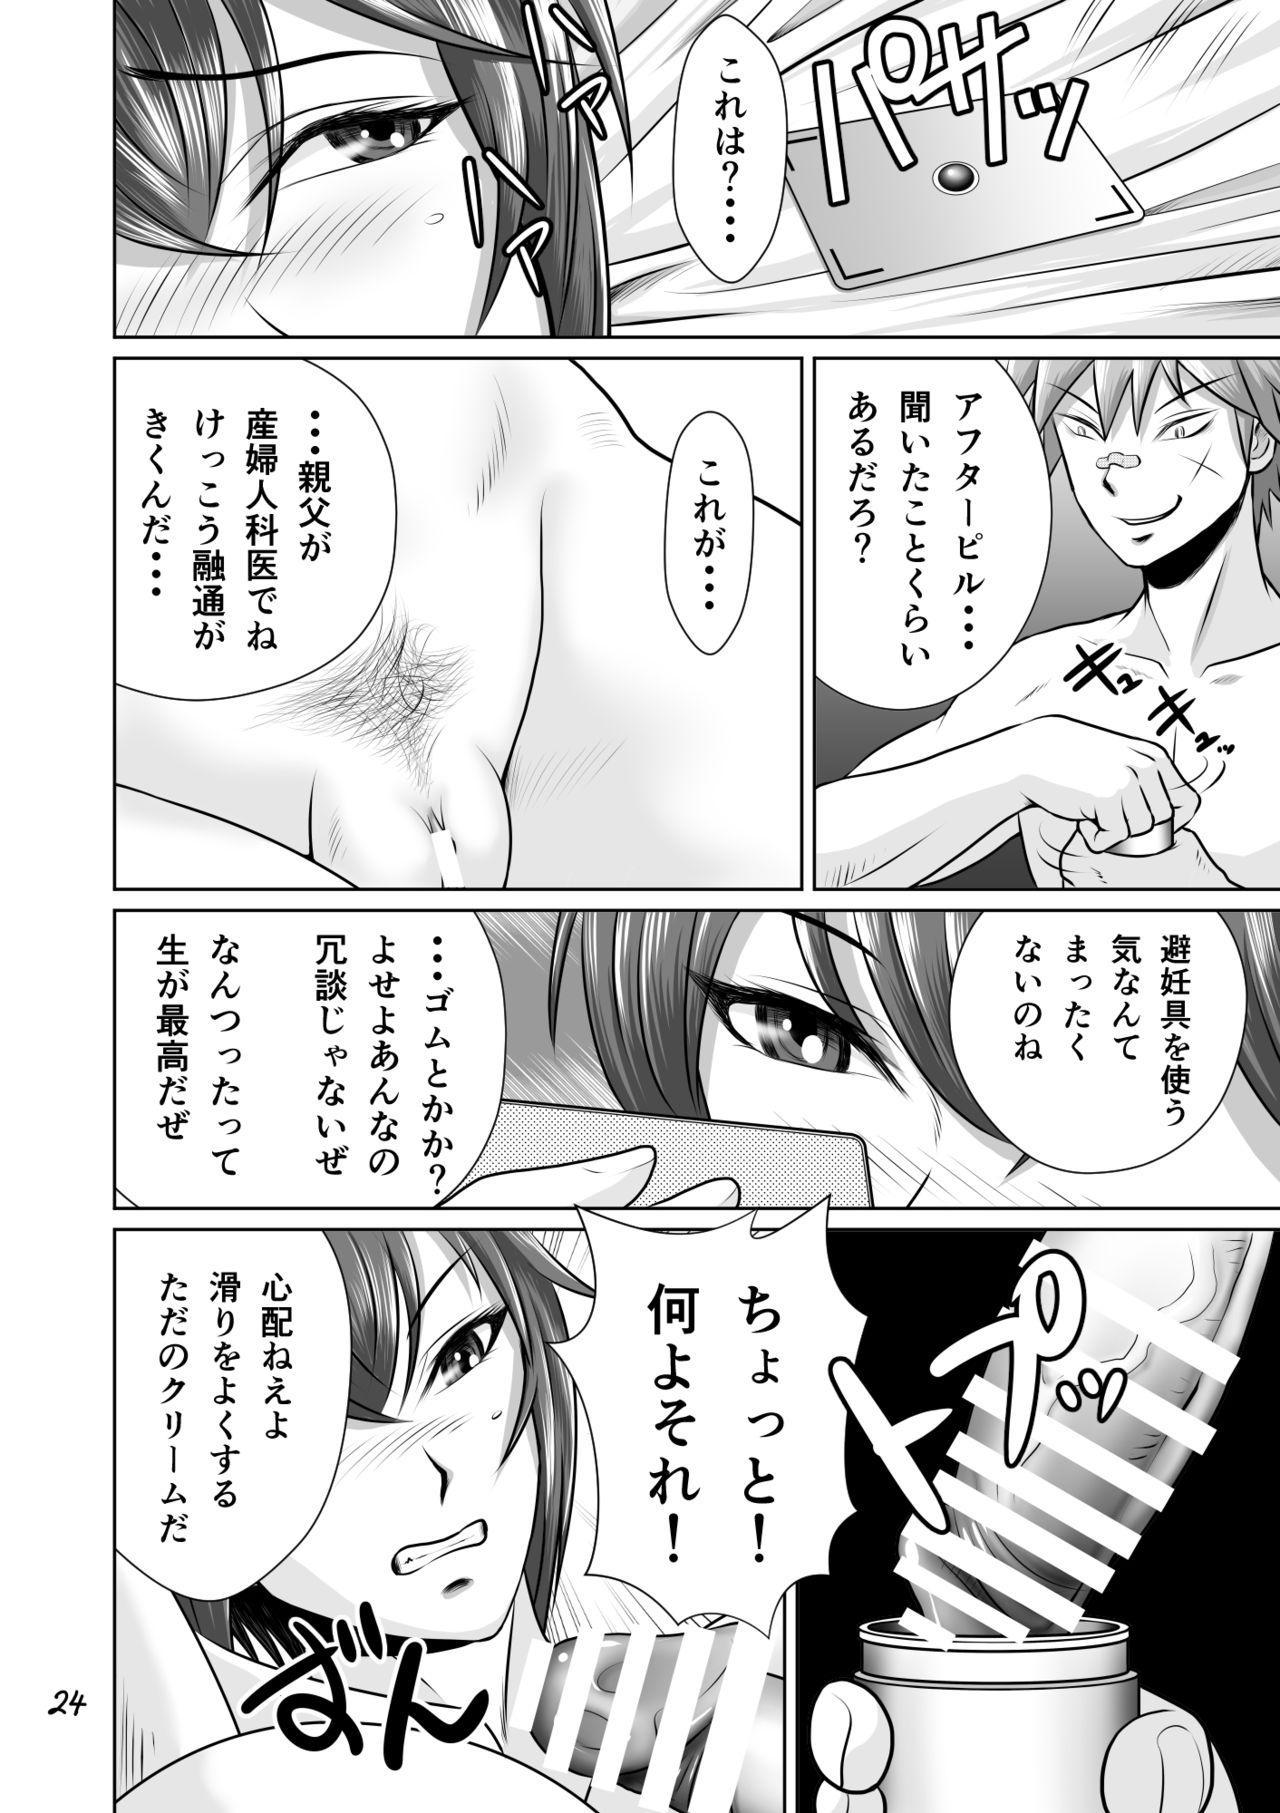 Netorare Osananajimi Haruka-chan Kiki Ippatsu!! 24